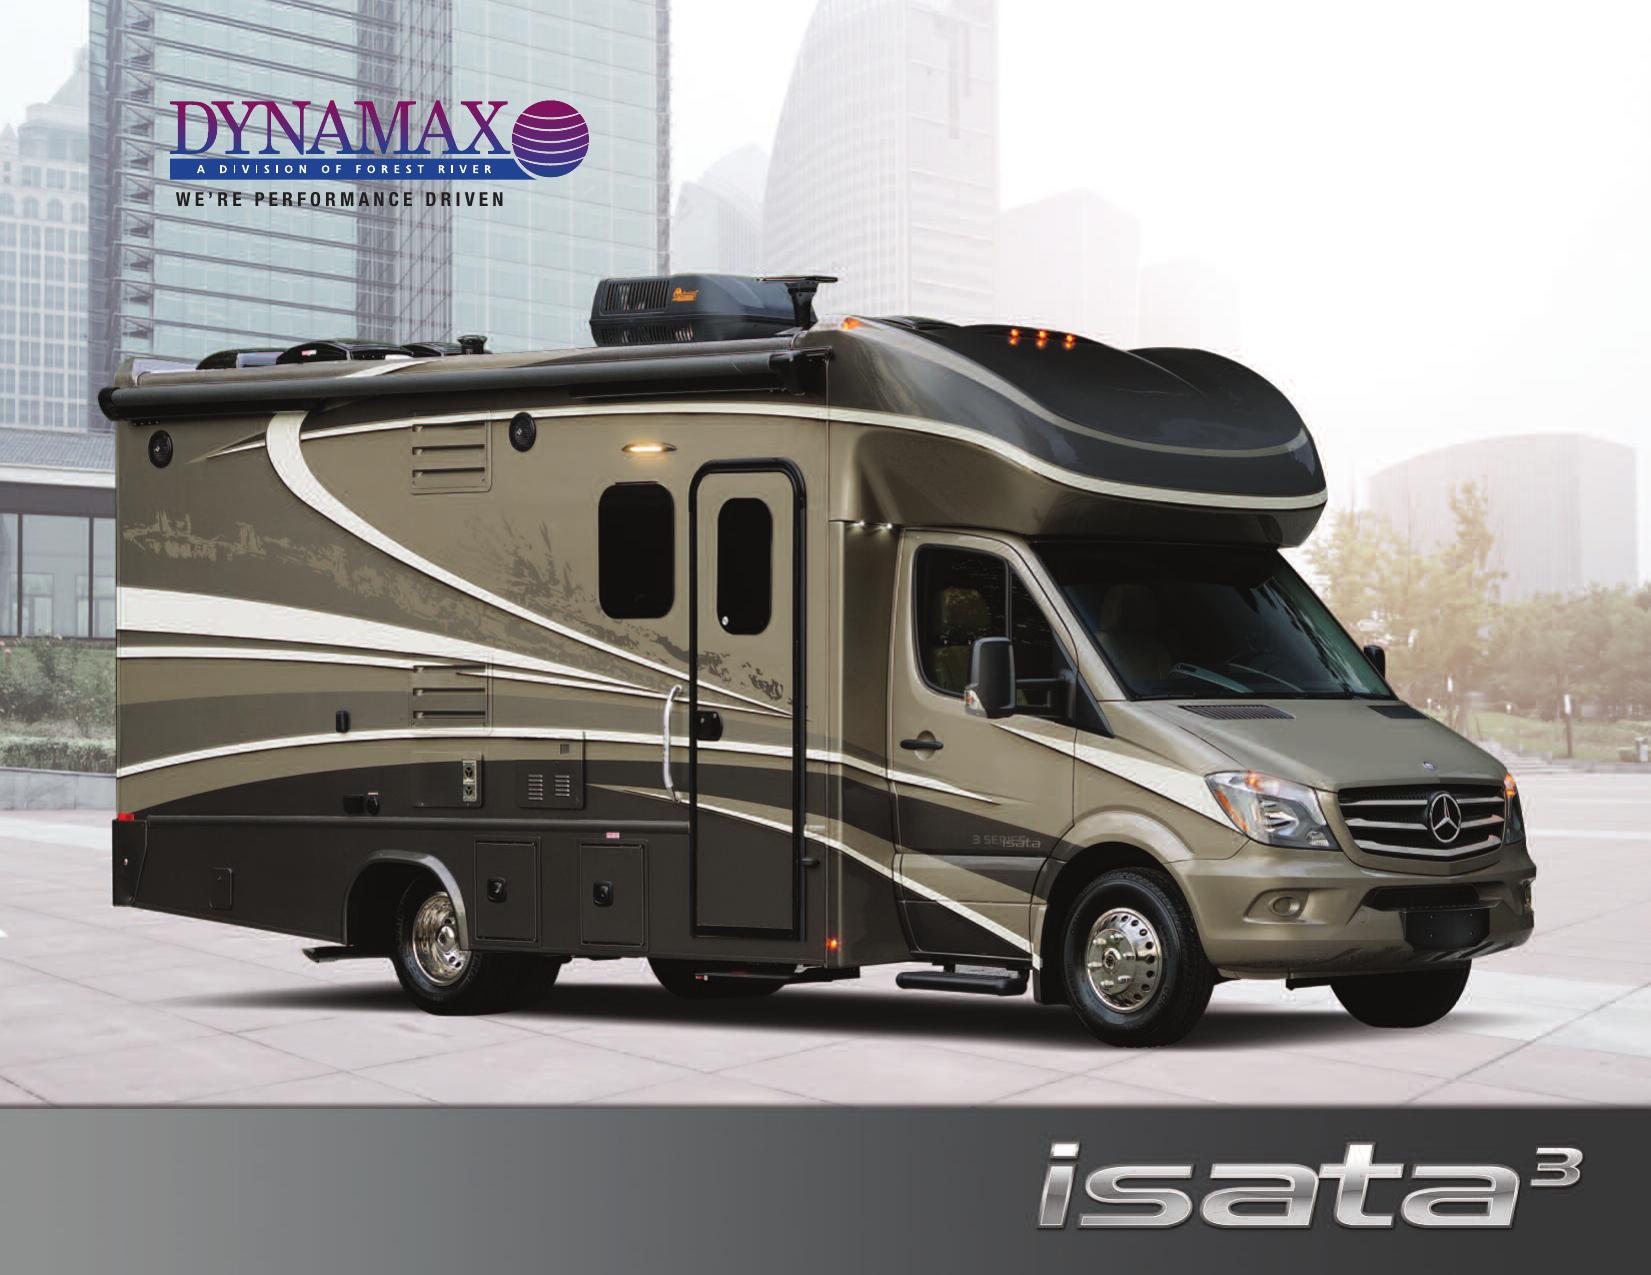 Dynamax Isata 3 2016 Brochure Motorhomes 2 Go | manualzz com